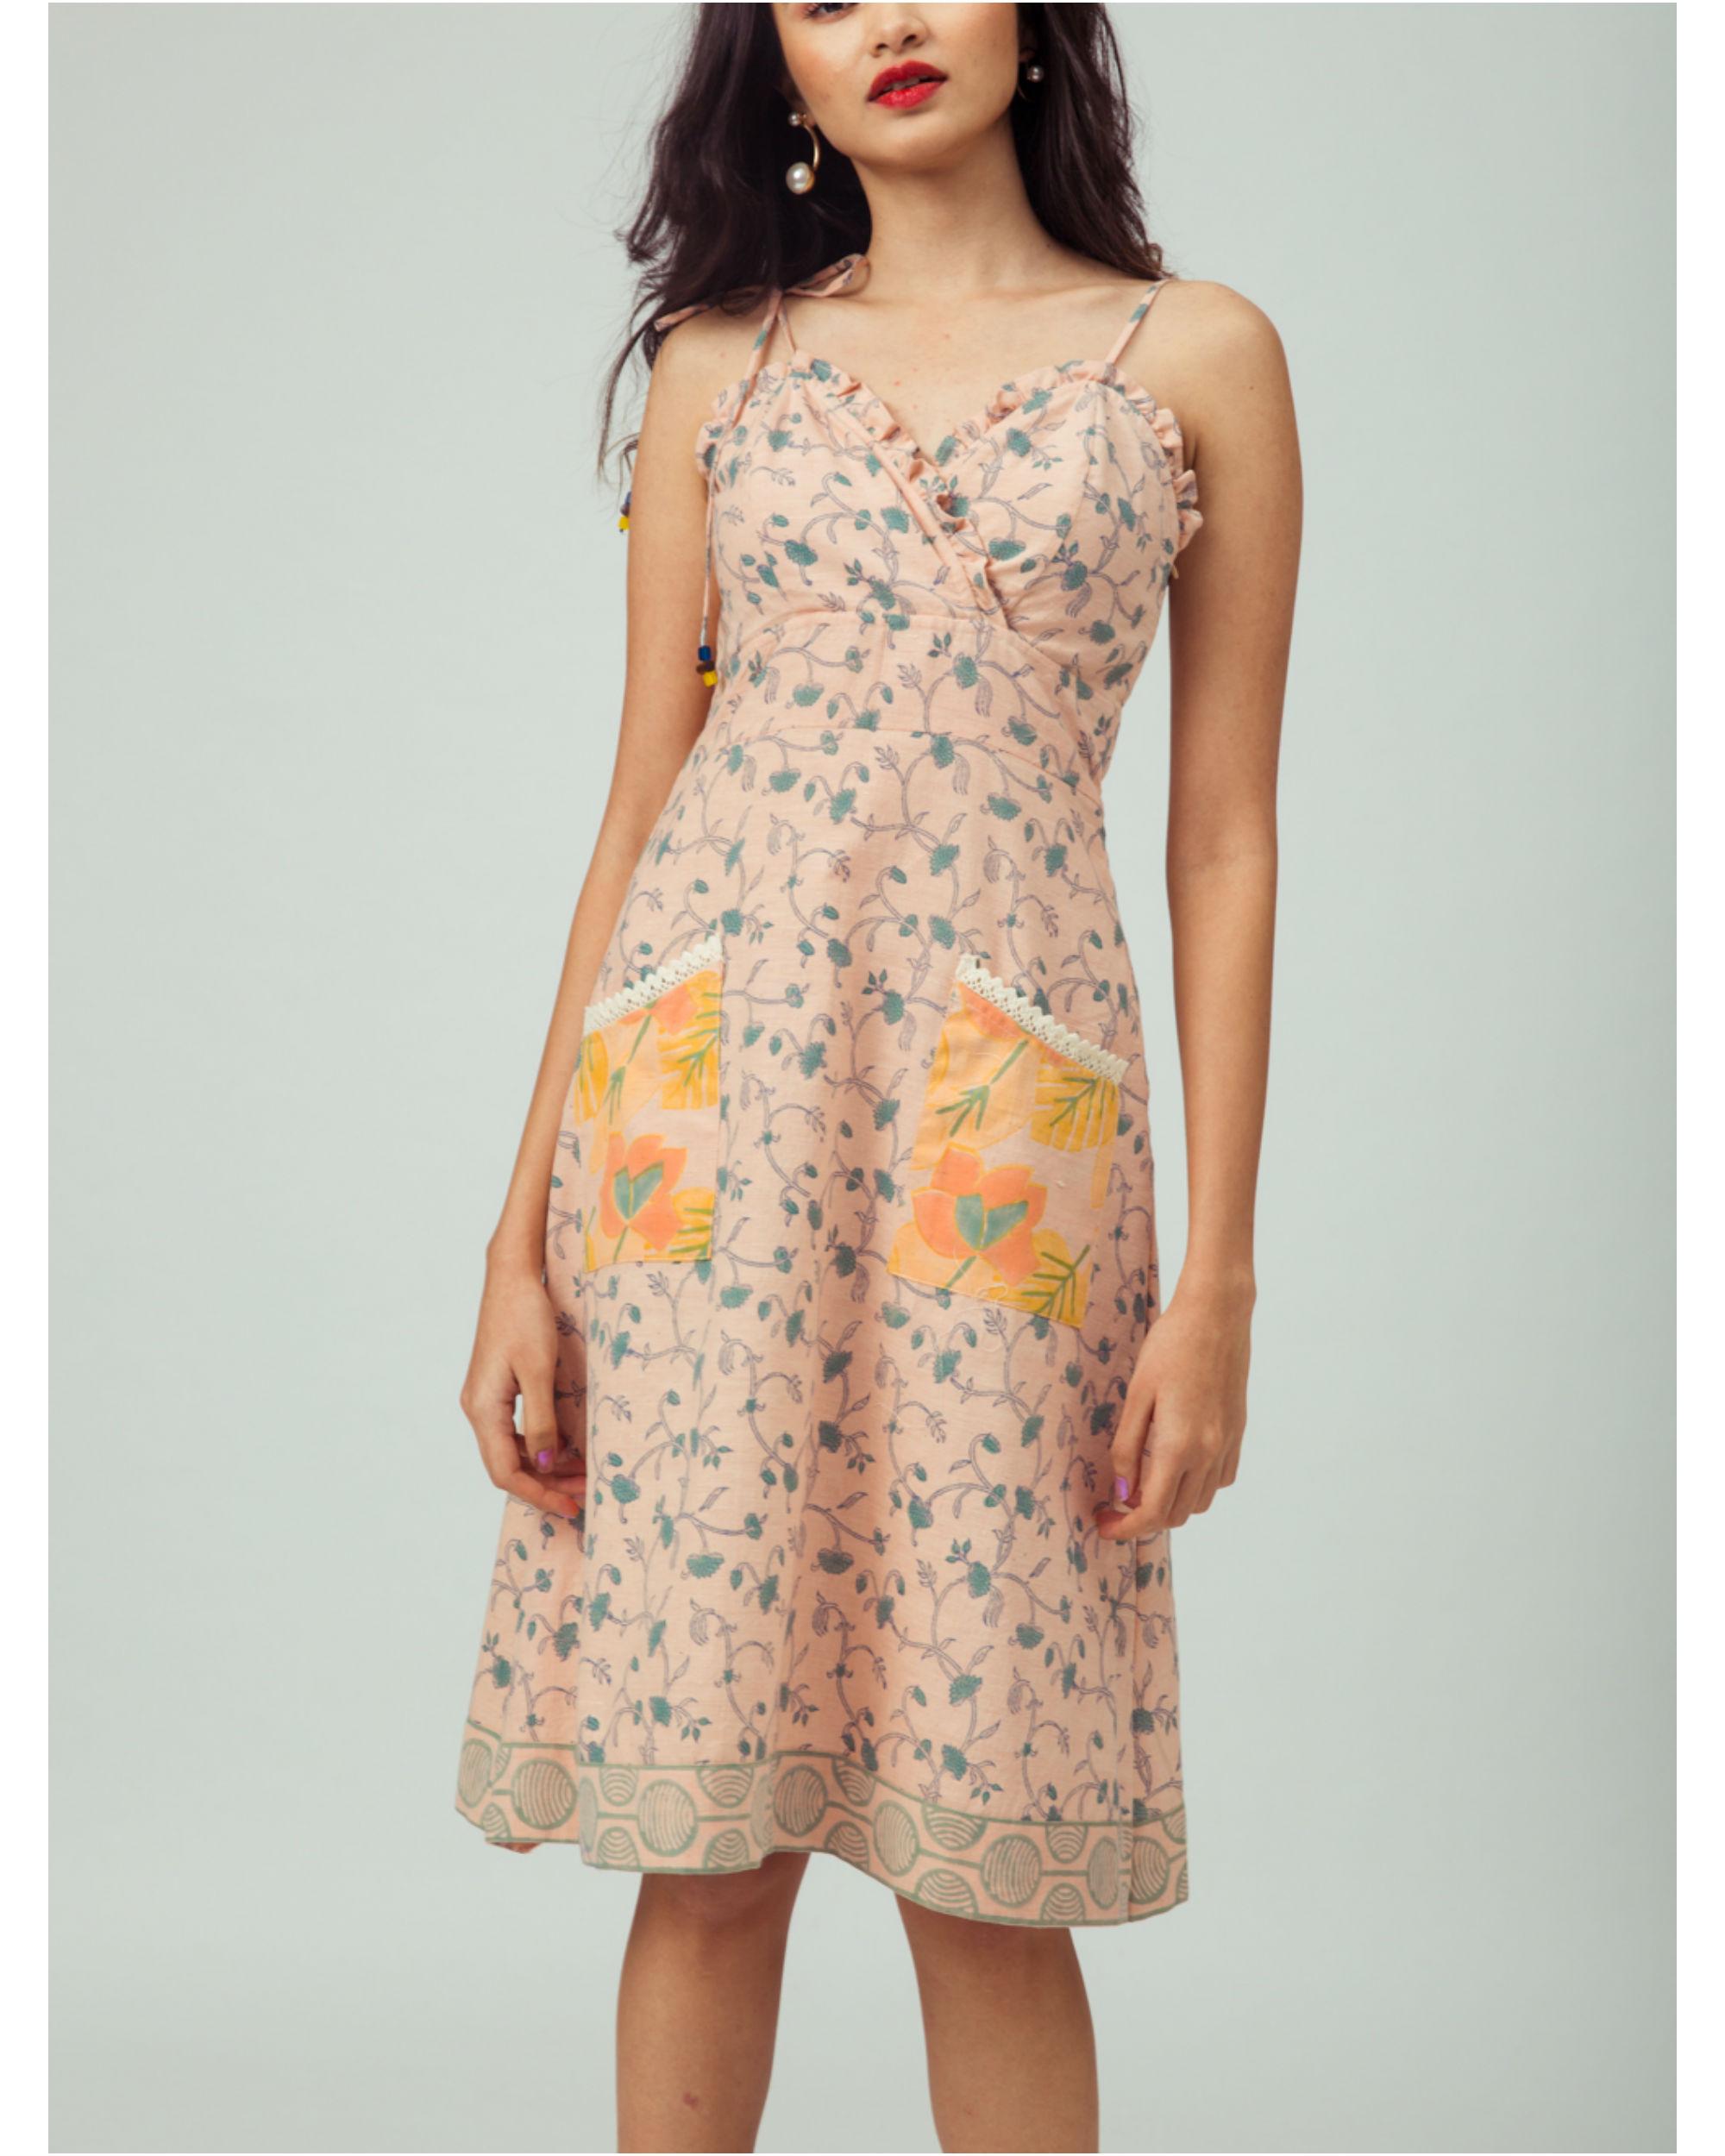 Salmon Starflower Strappy Dress